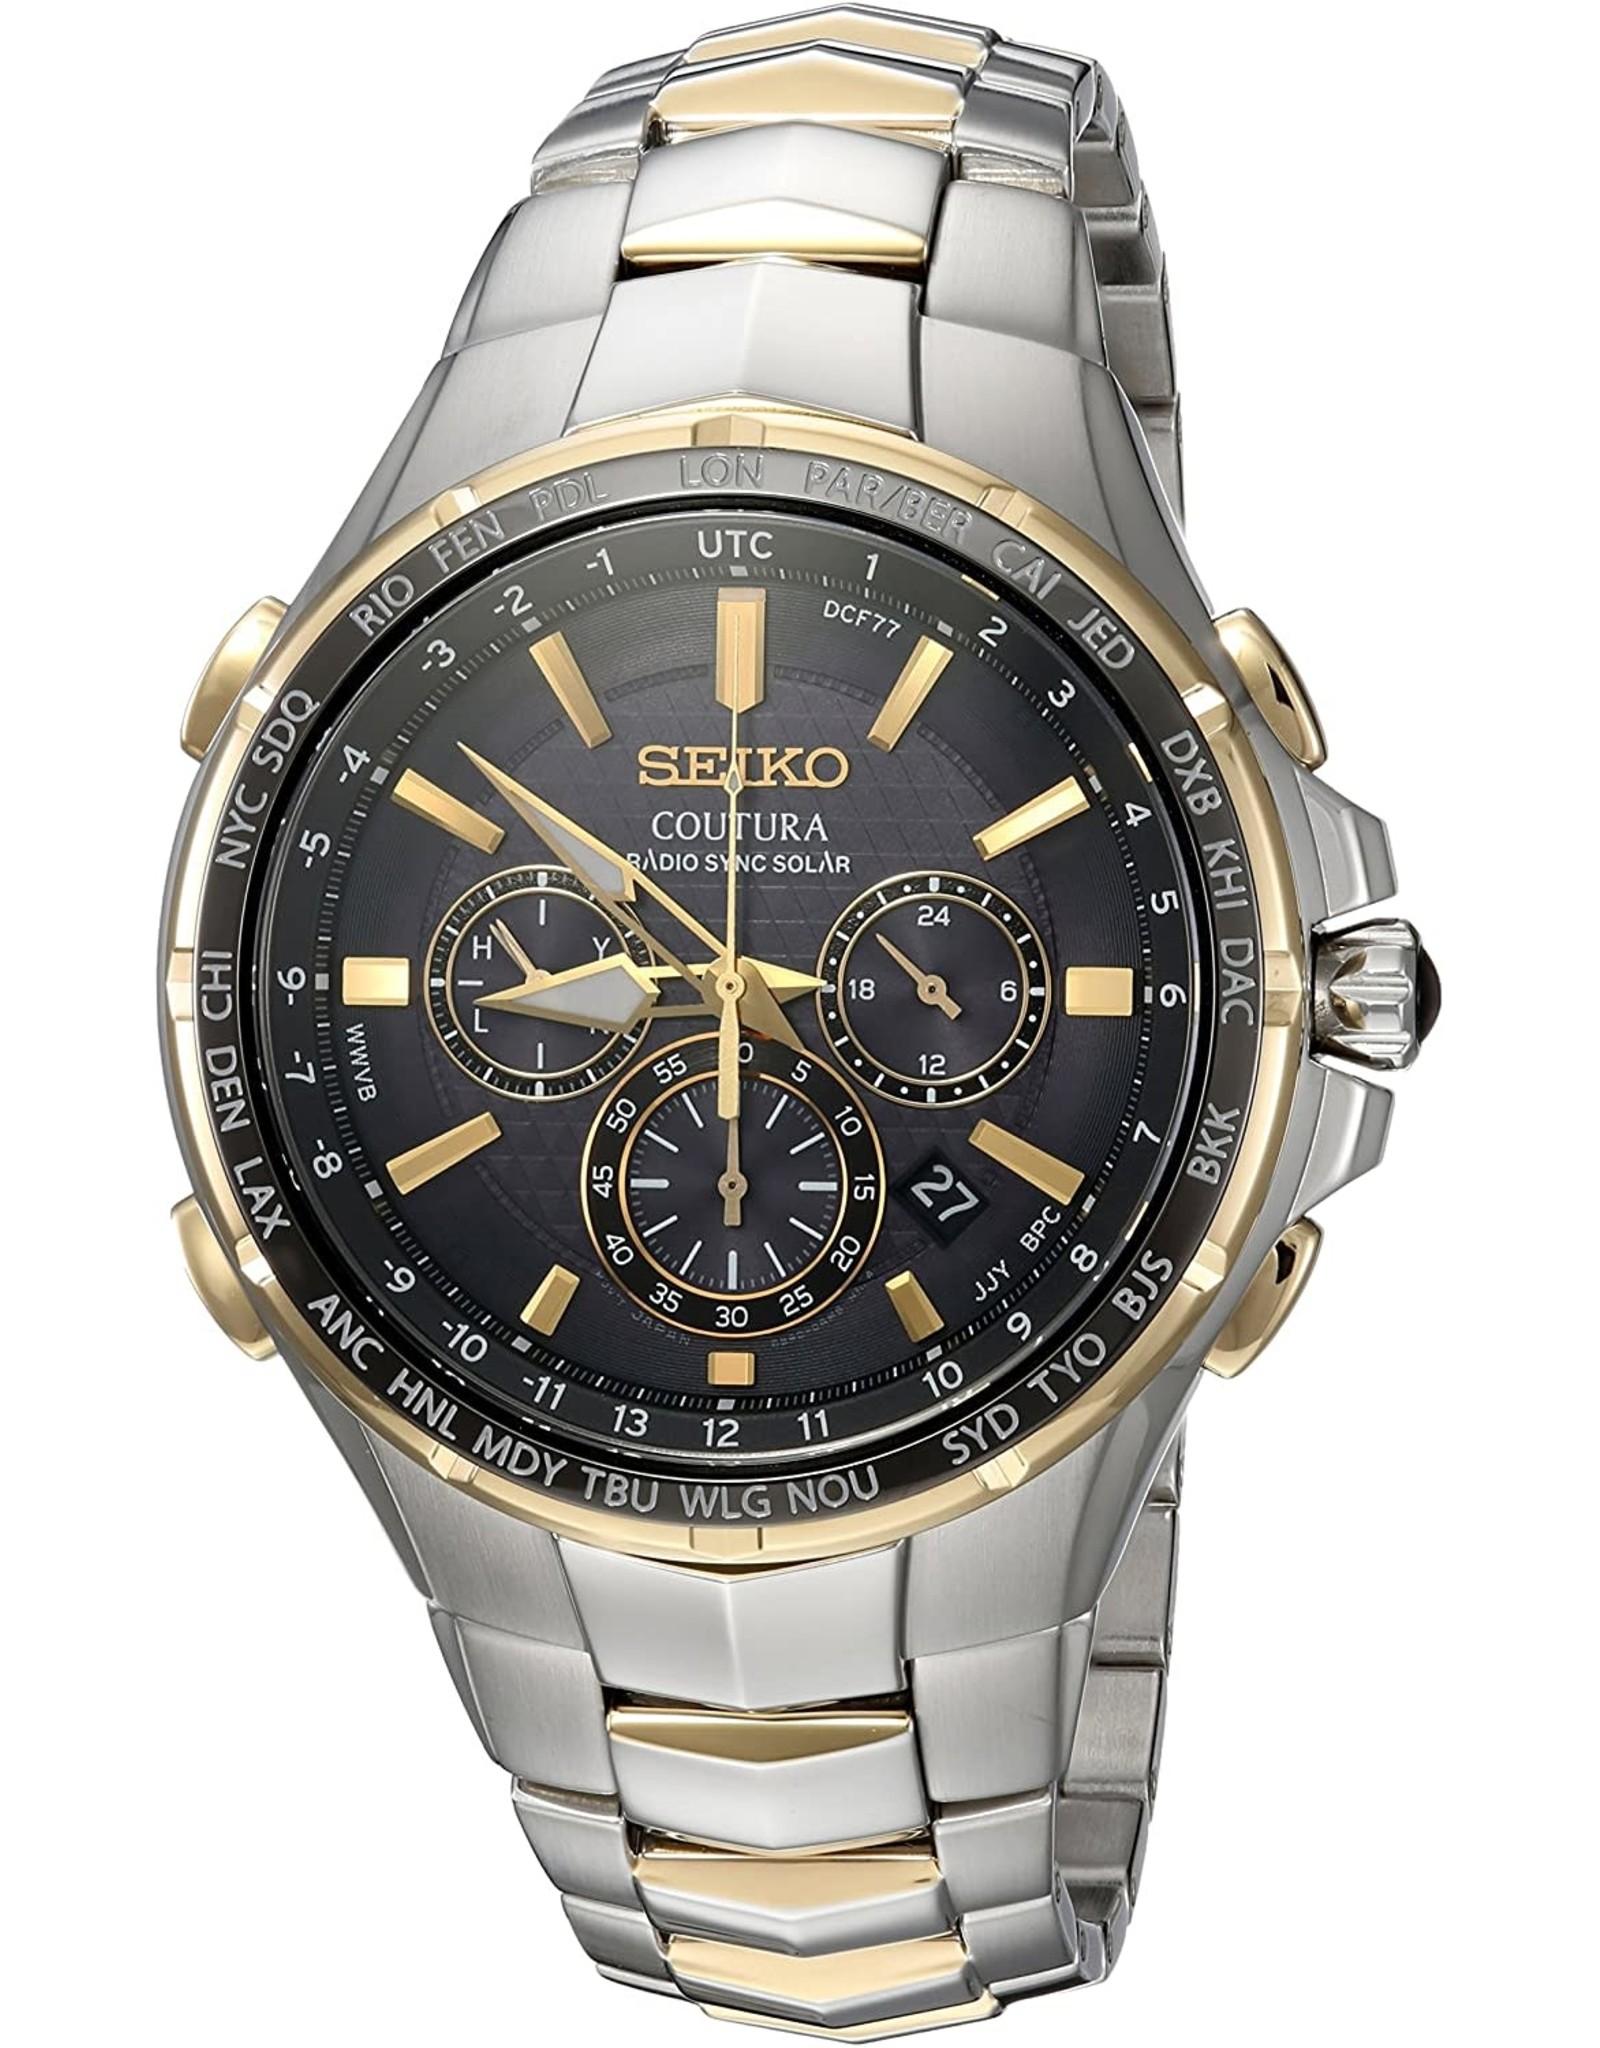 Mens Seiko Coutura Radio Sync Solar Two Tone Watch, 44.5mm